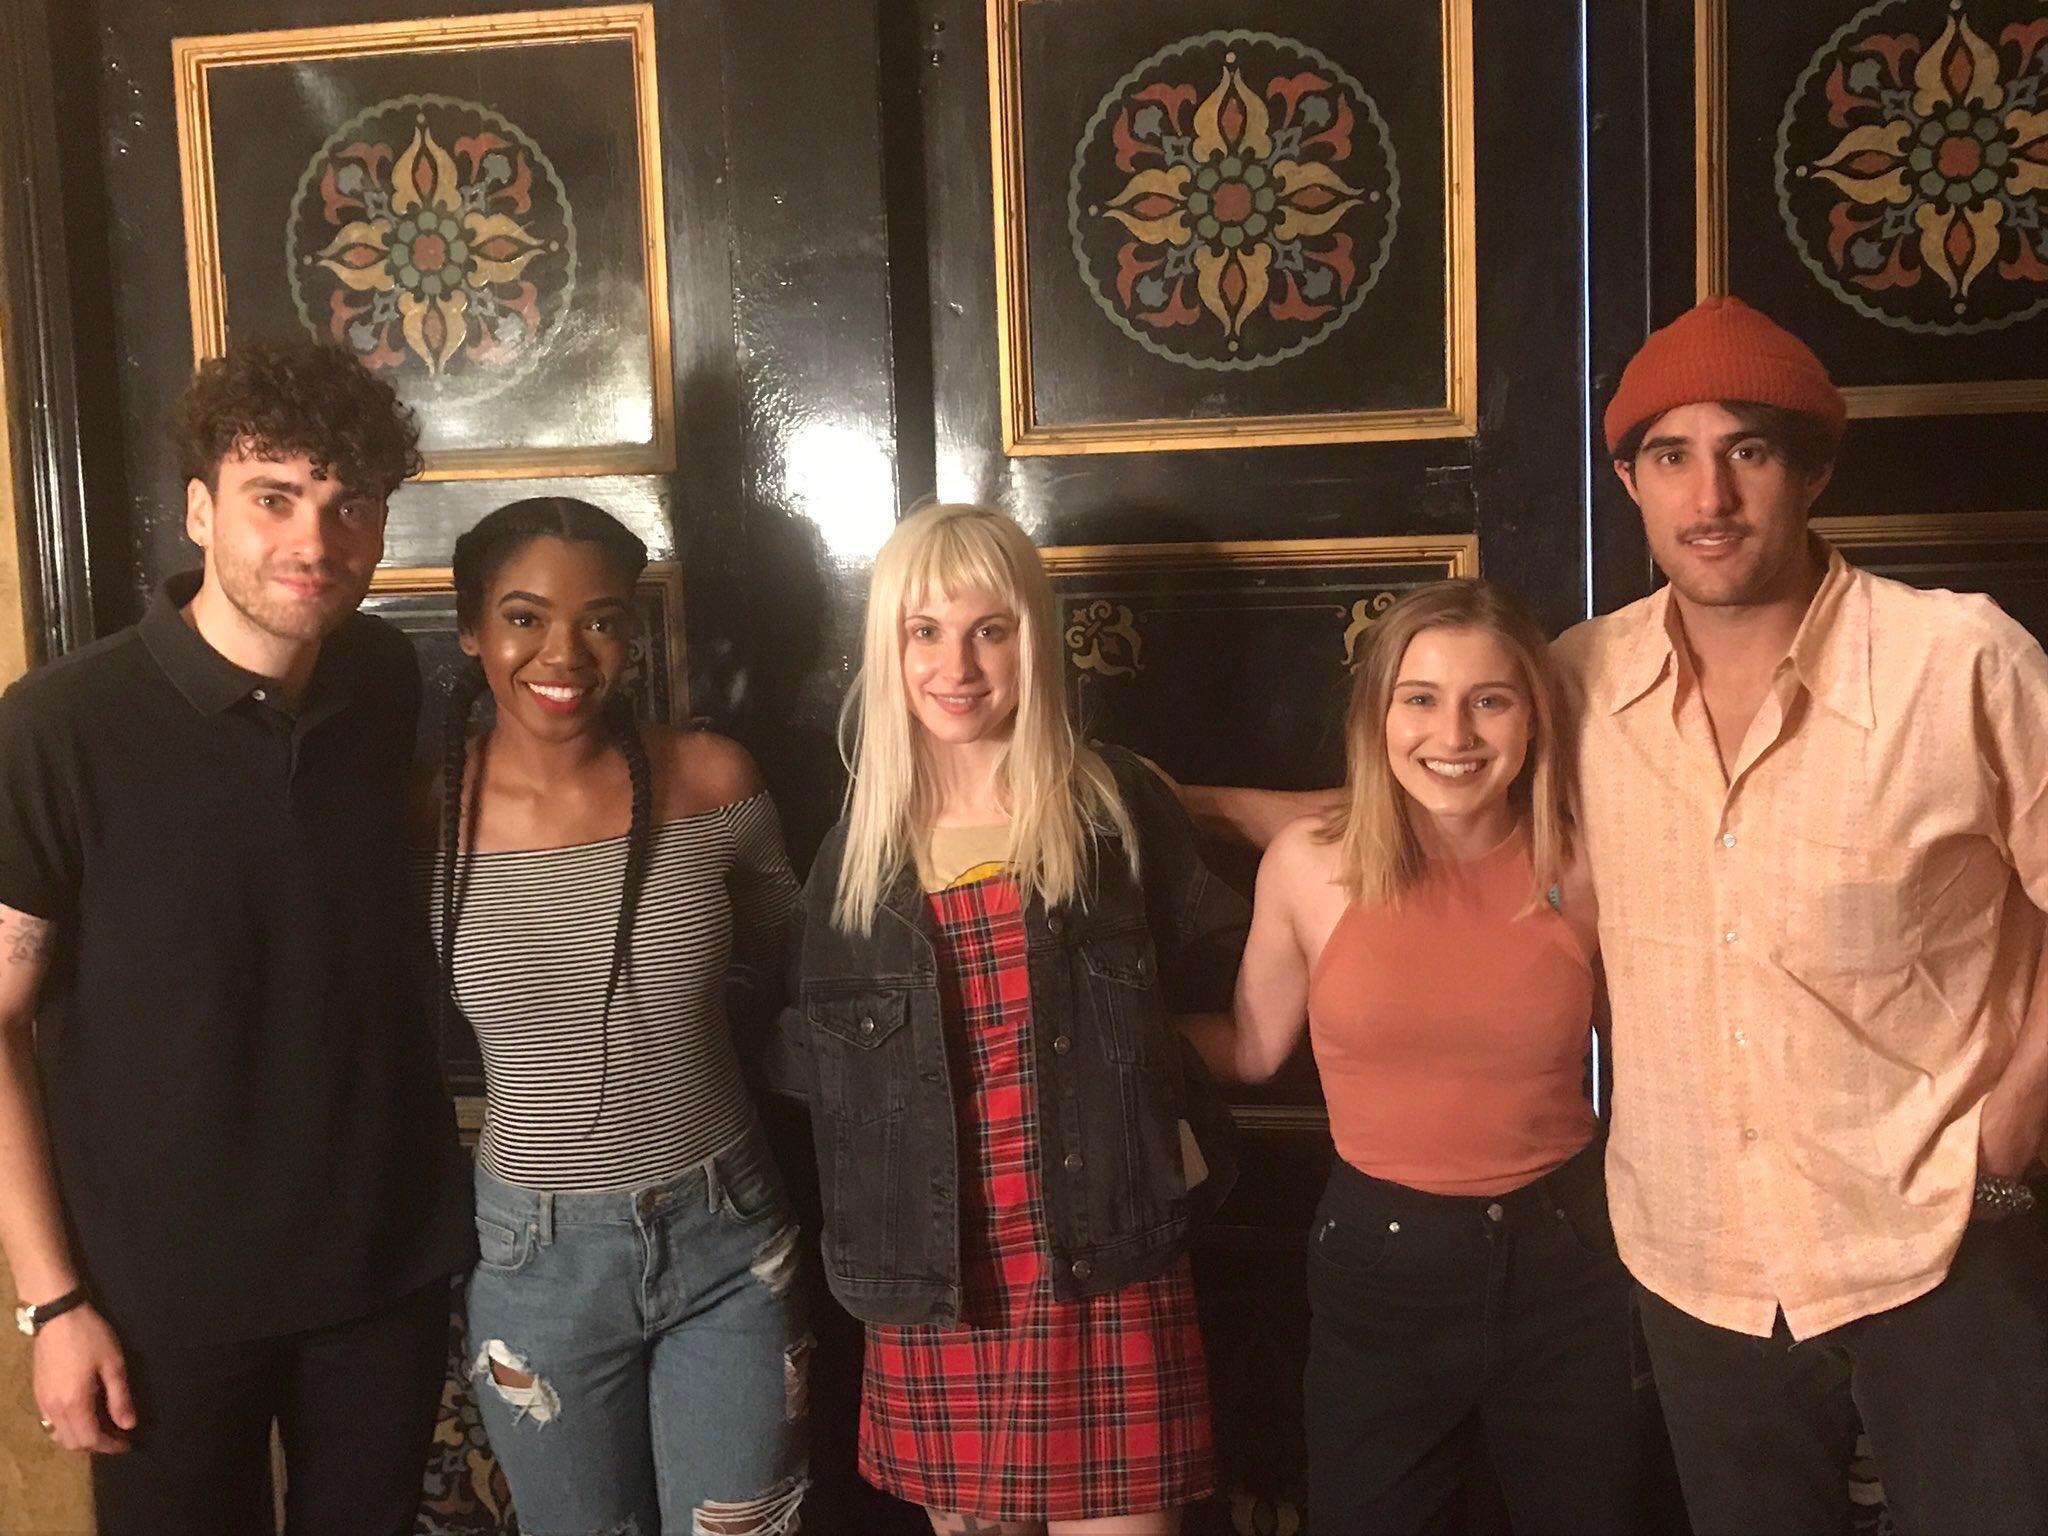 Paramore Meet & Greet with fans in Atlanta, GA! https://t.co/8U2GufLFod